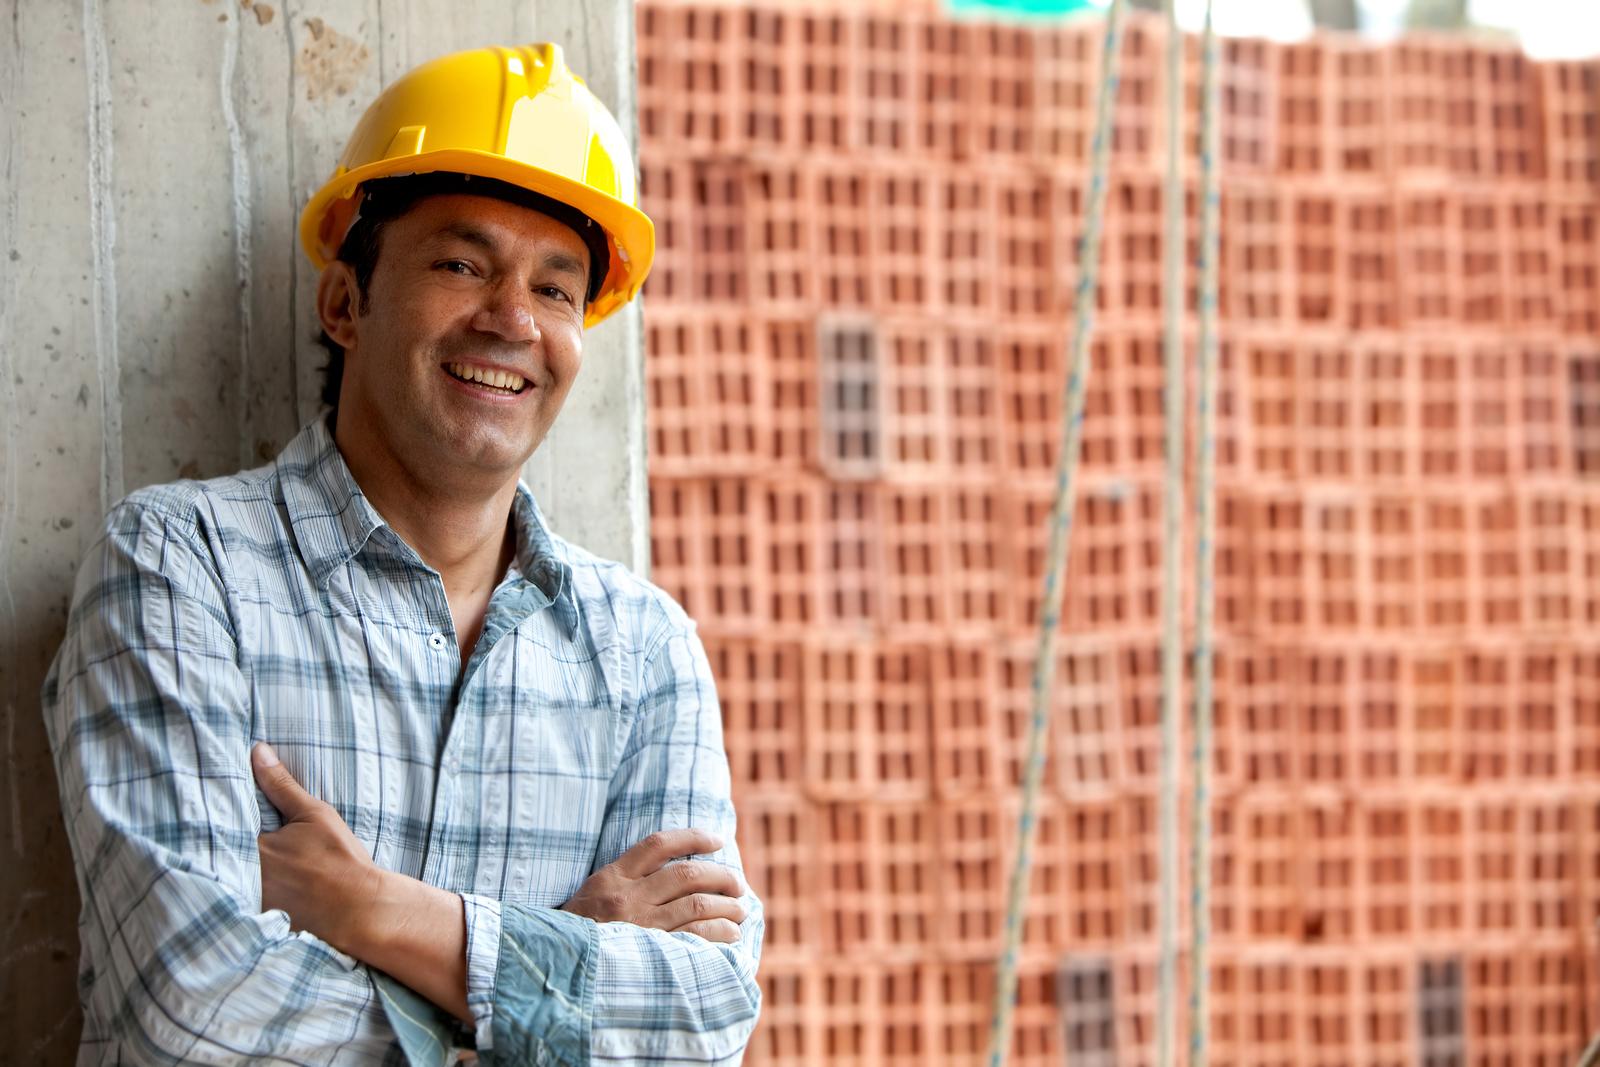 bigstock-Happy-male-construction-worker-